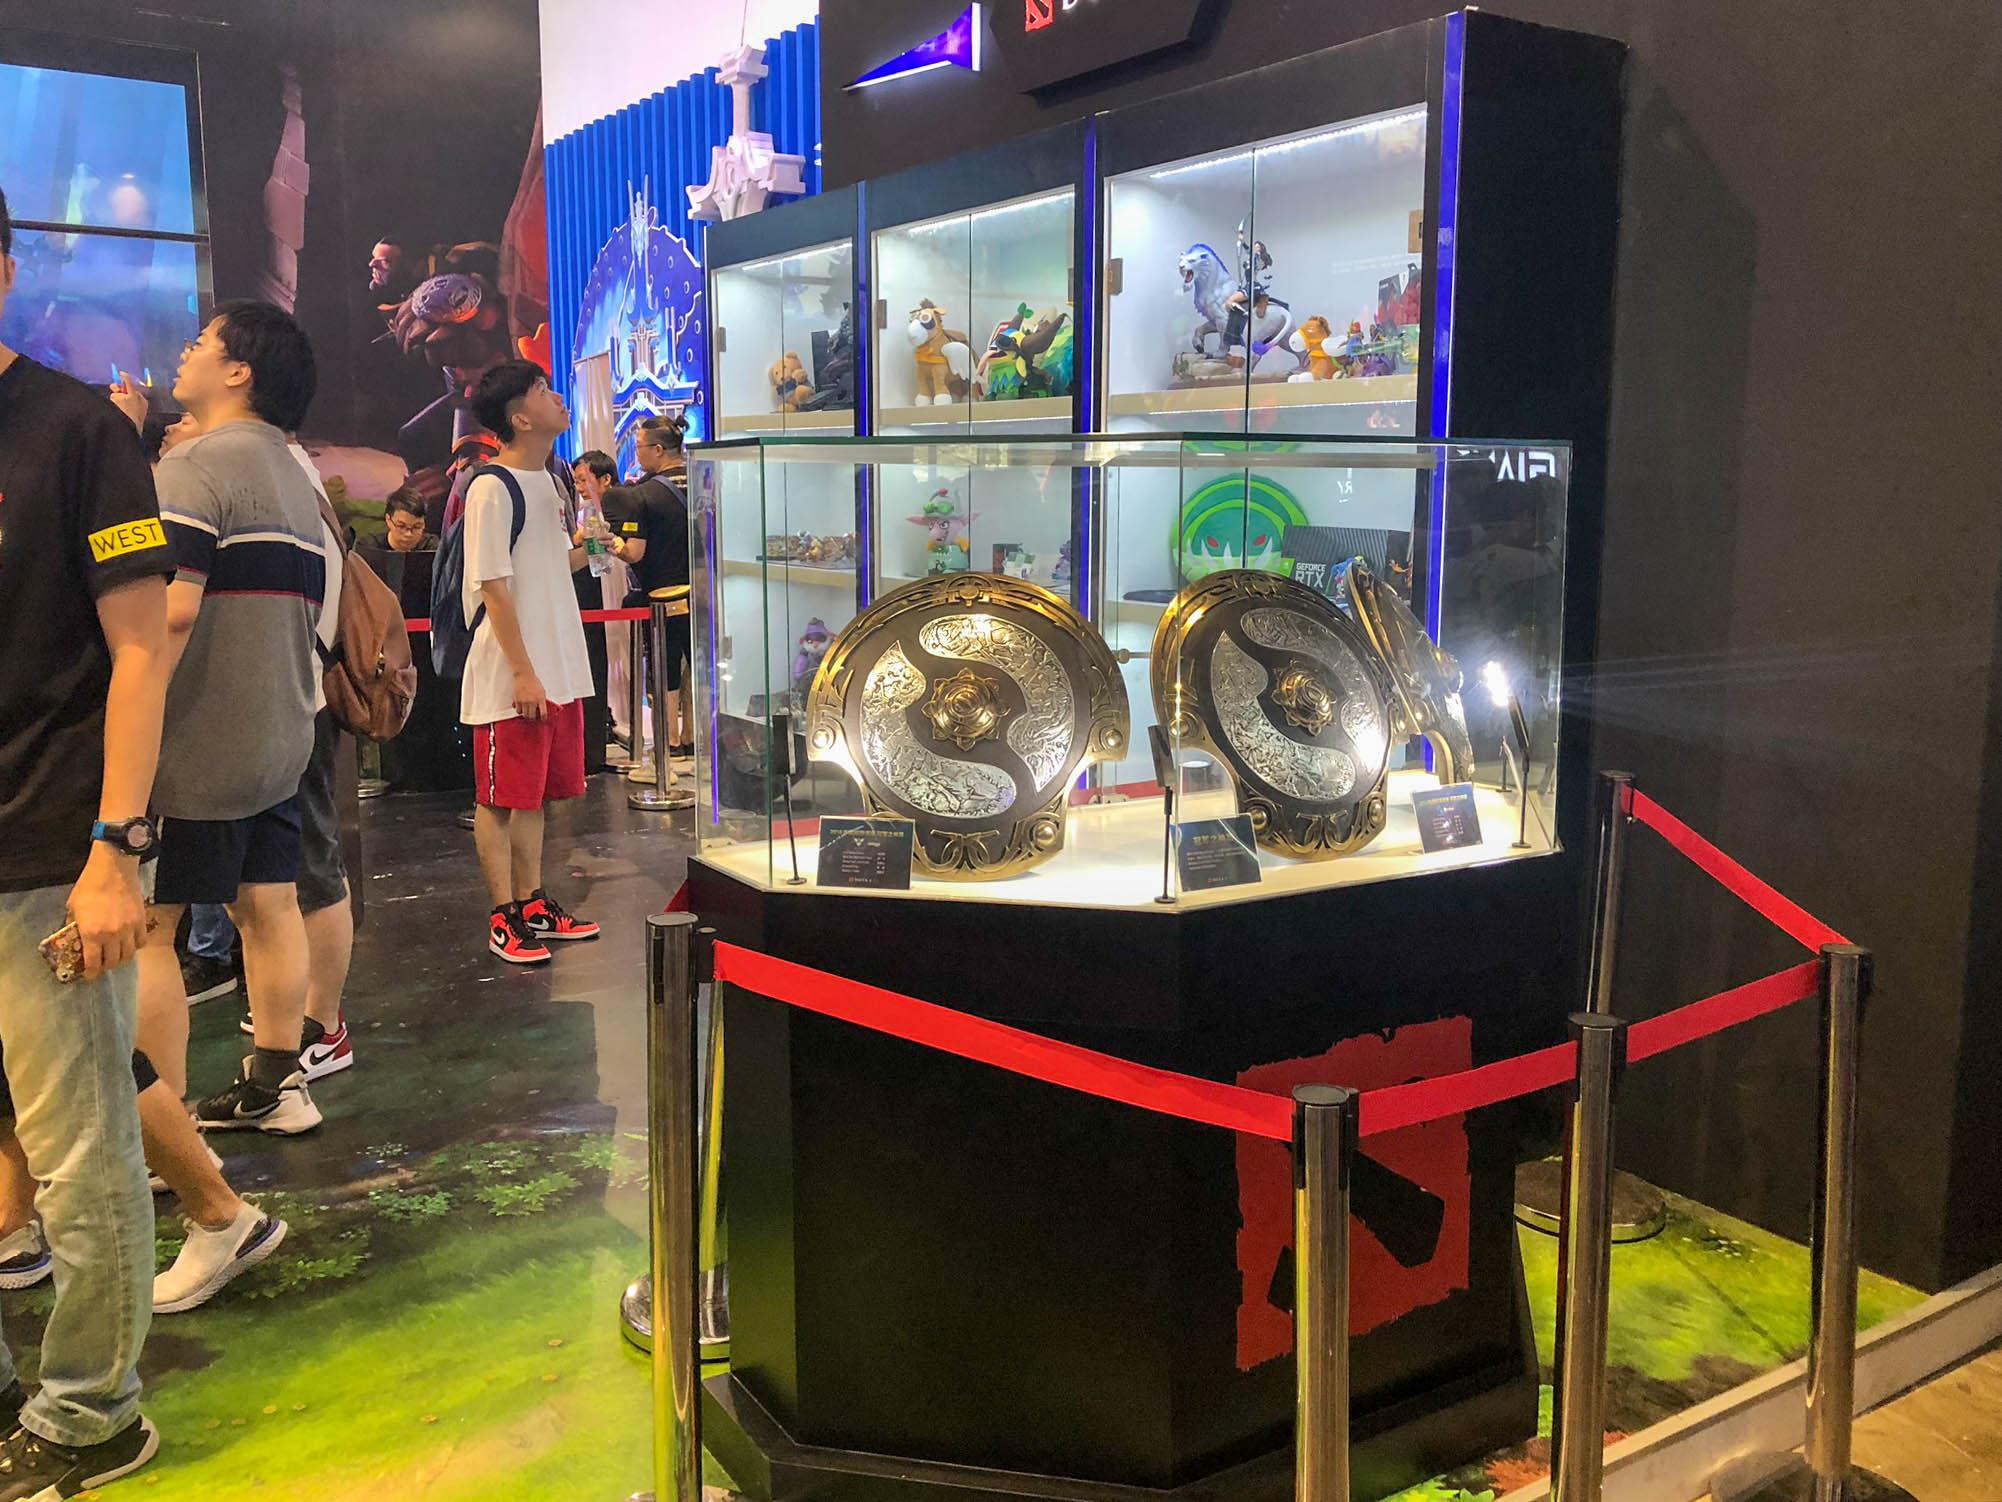 2019 ChinaJoy 中国国际数码互动娱乐展览会 游玩 第60张